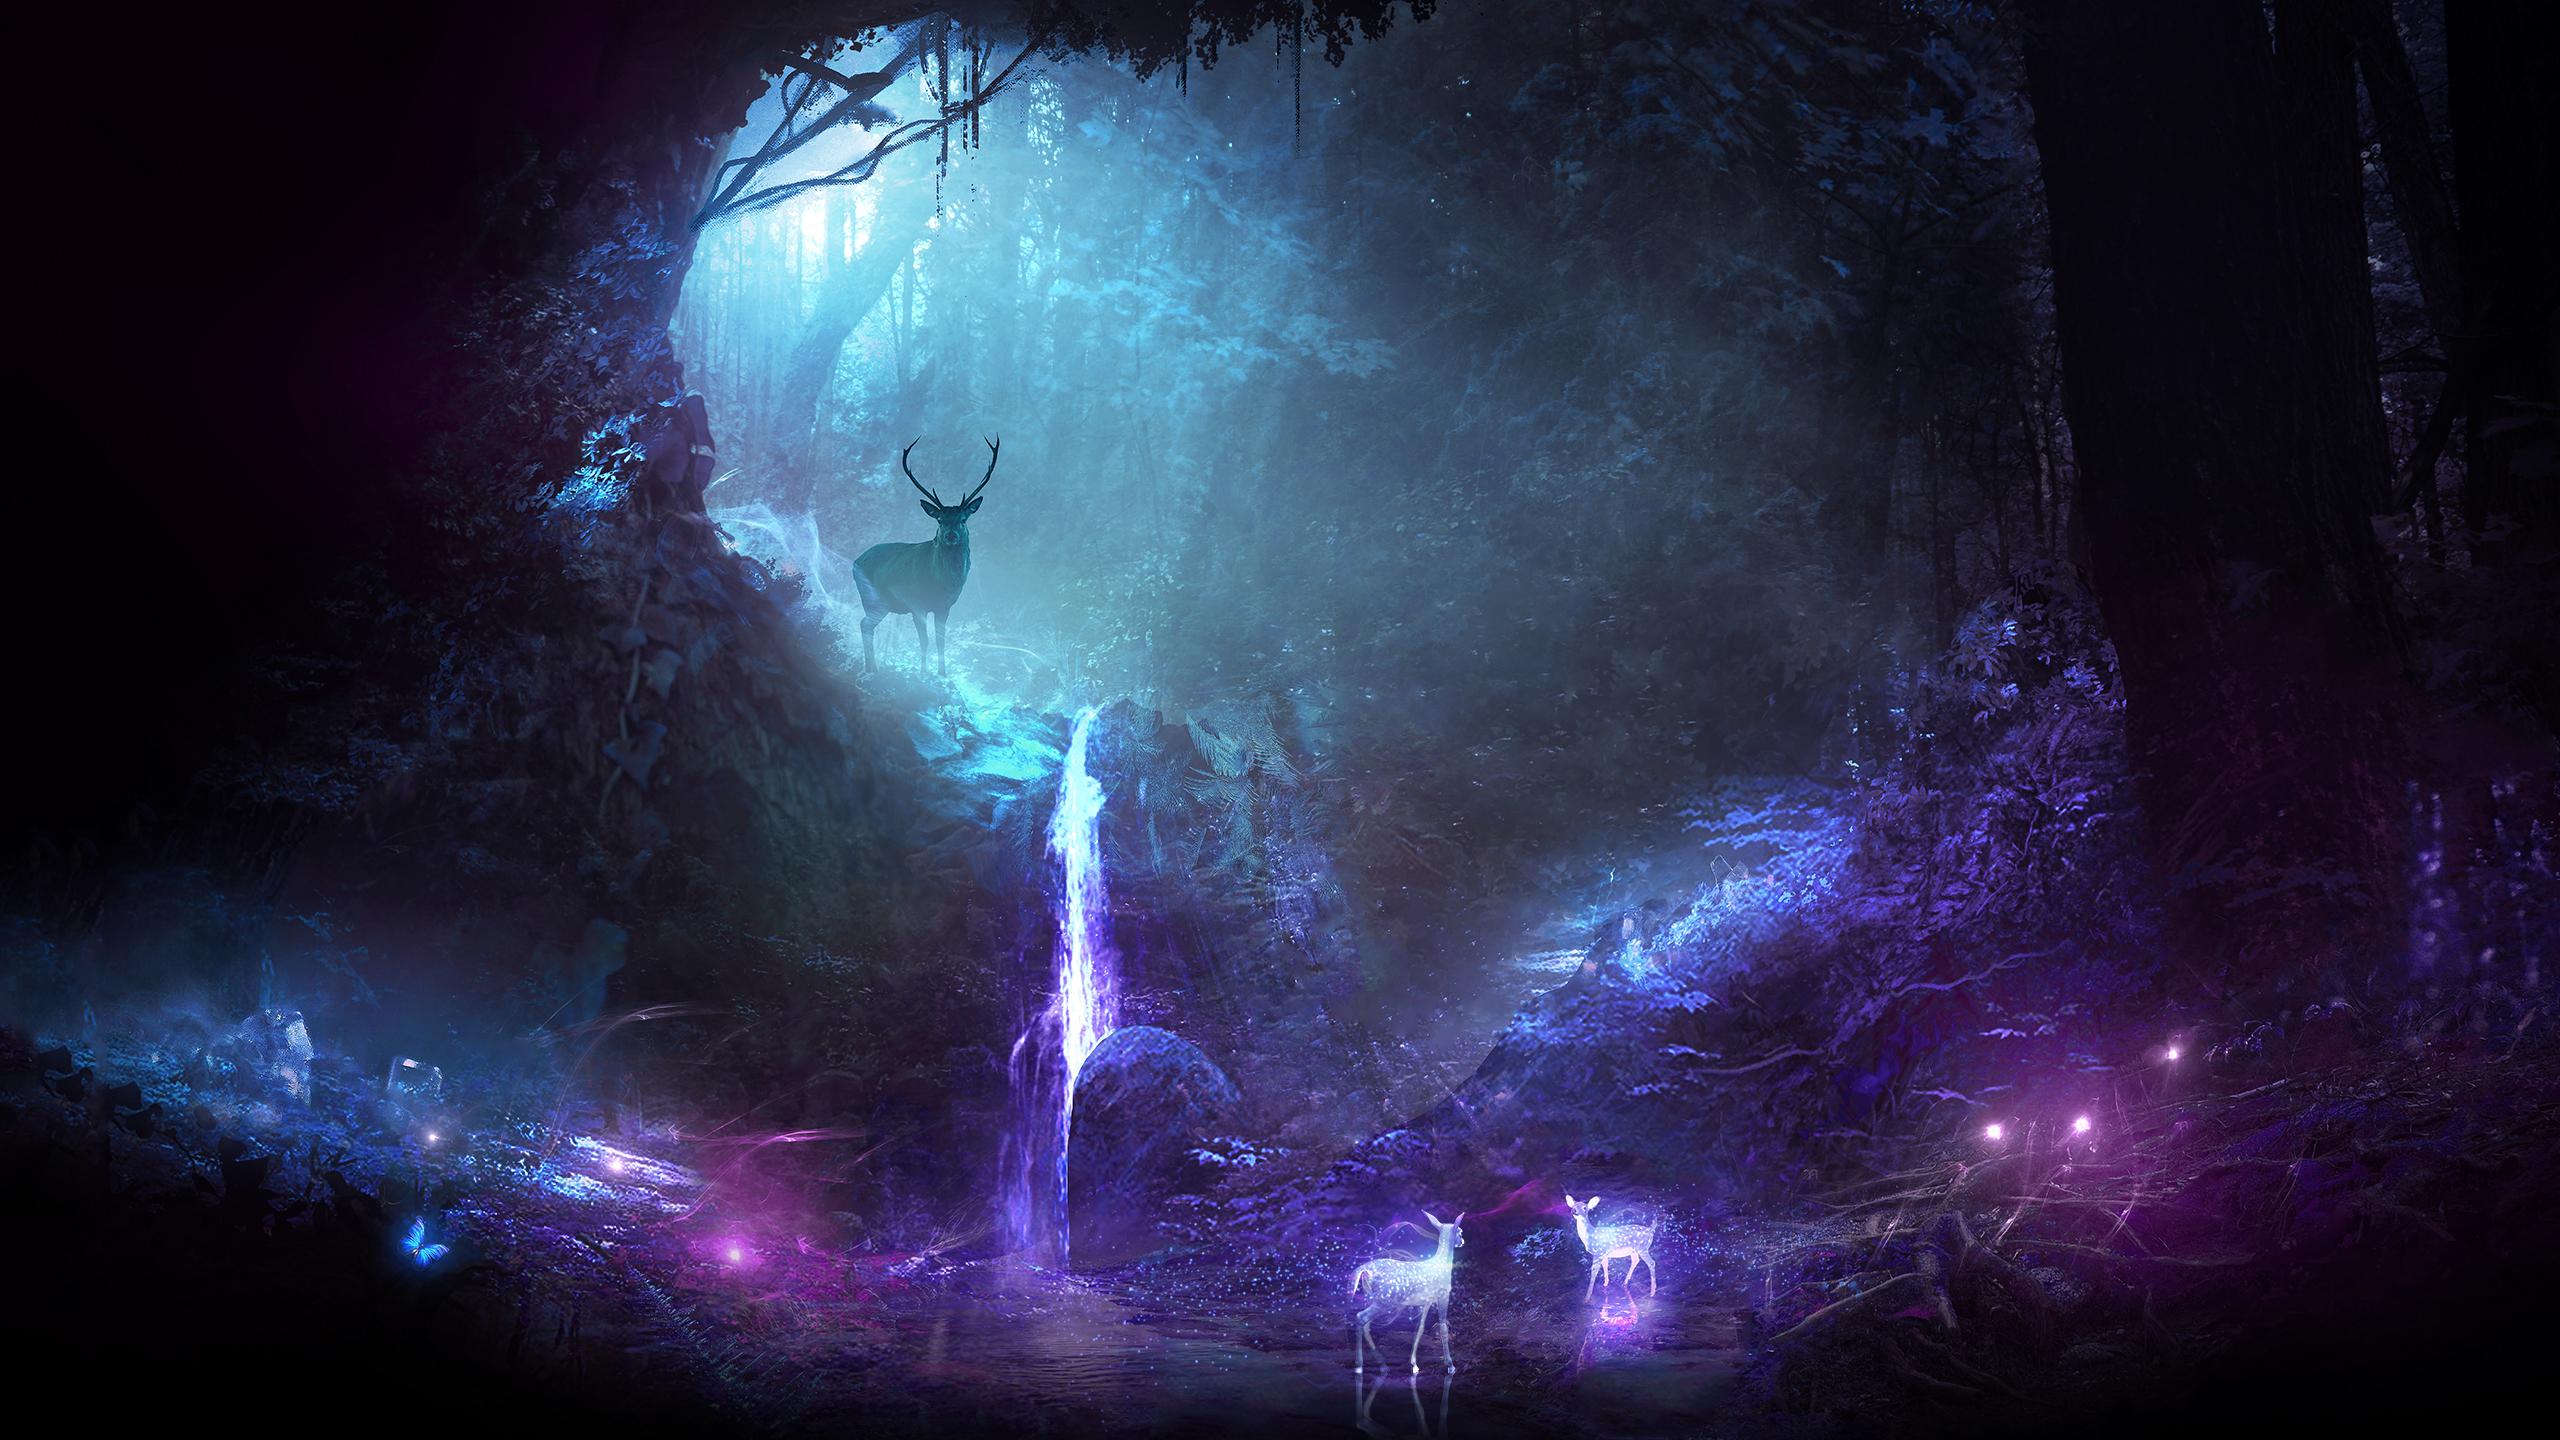 Dark Fall Iphone Wallpaper Deer Full Hd Wallpaper And Background 2560x1440 Id 889635